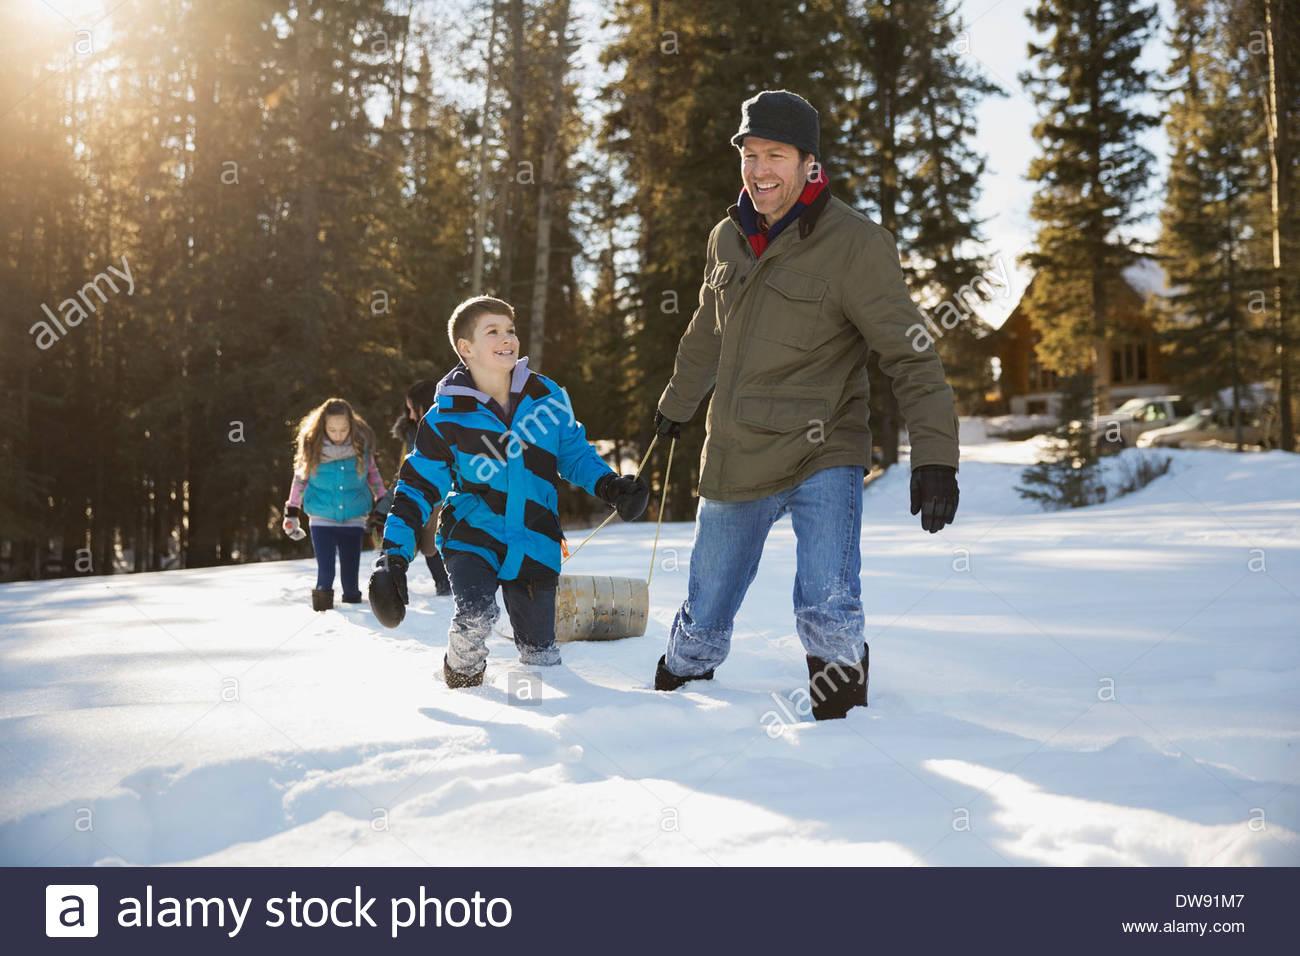 Padre e hijo tirando de tobogán en la nieve Imagen De Stock